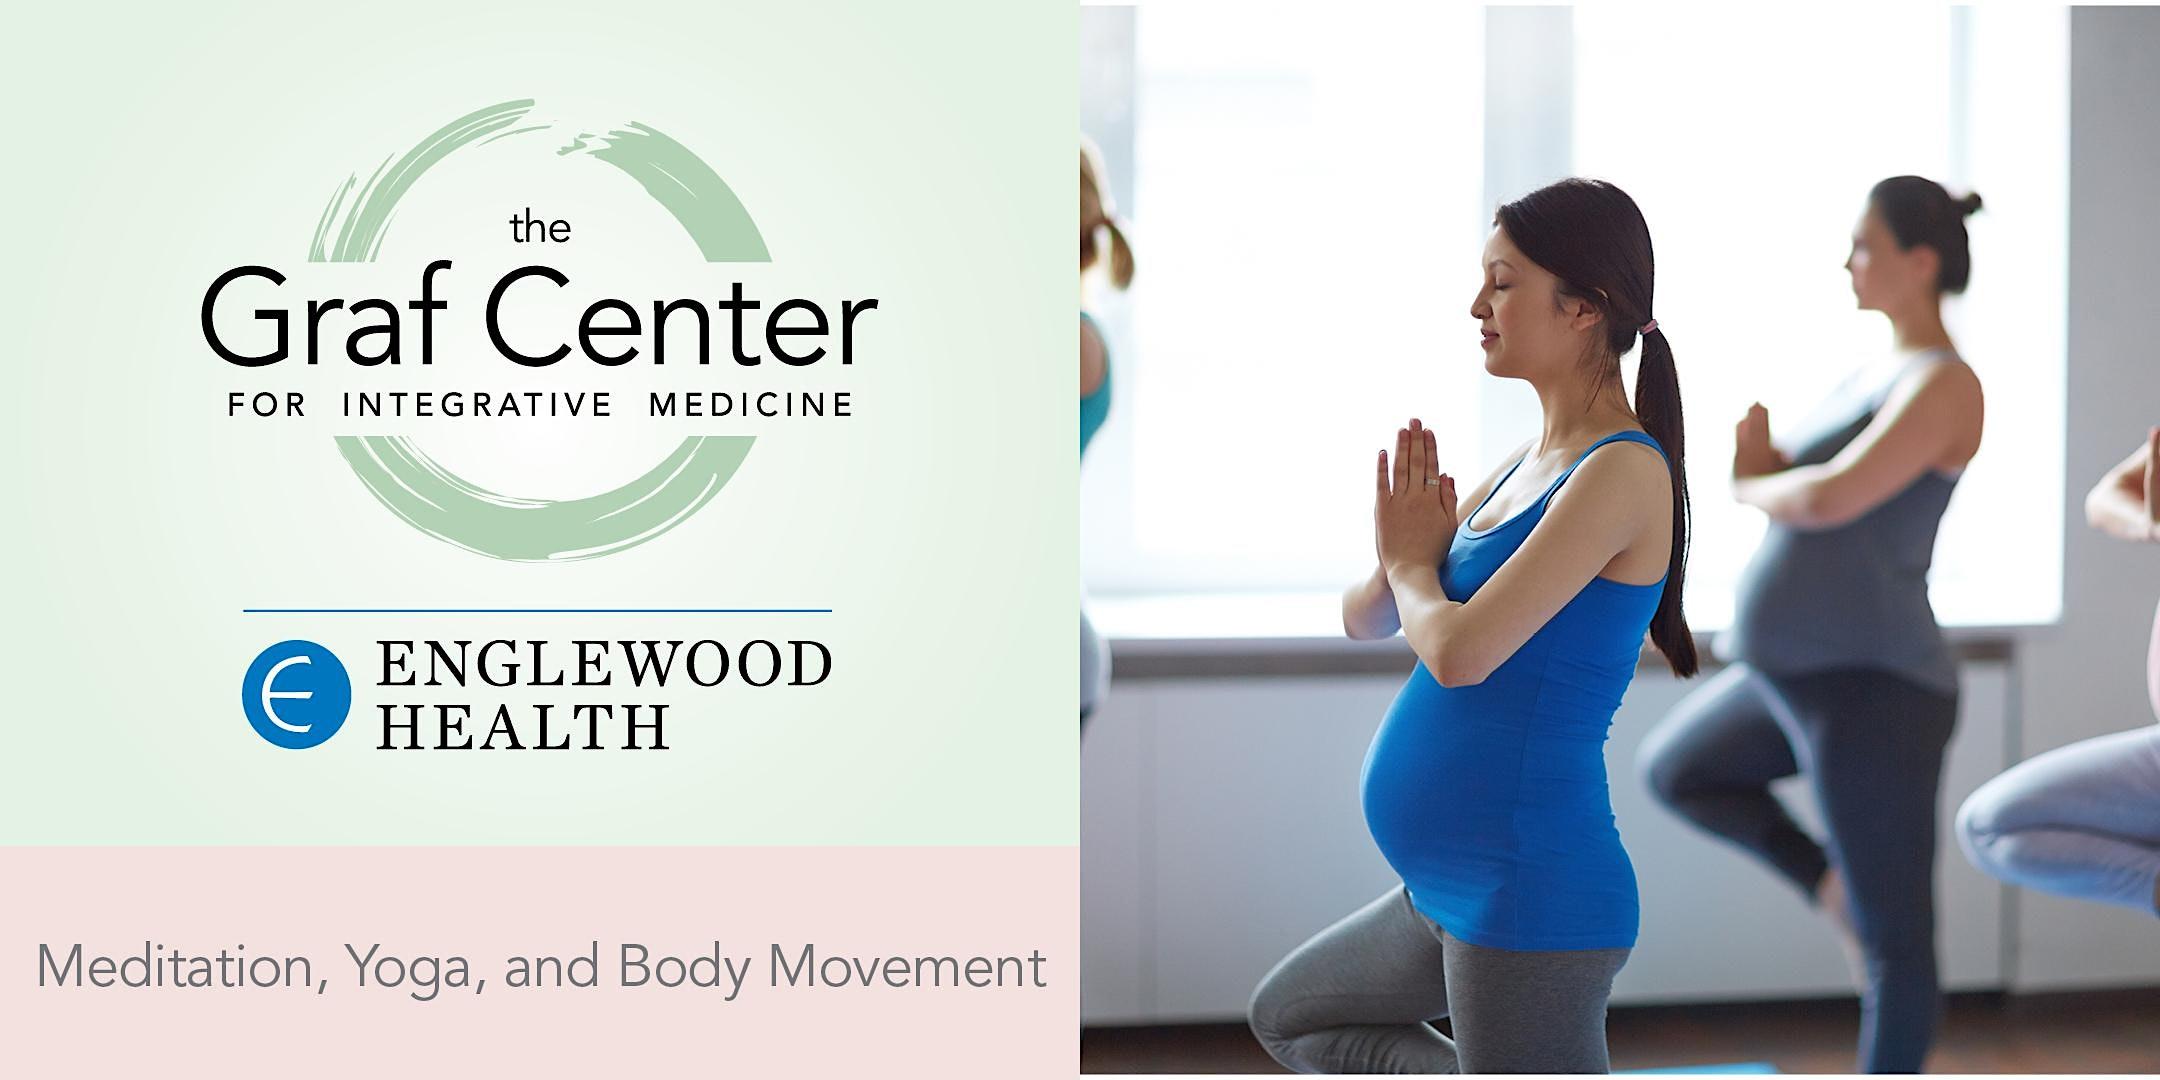 More info: Prenatal Yoga and Meditation (8-week series) - Beginning September 2021